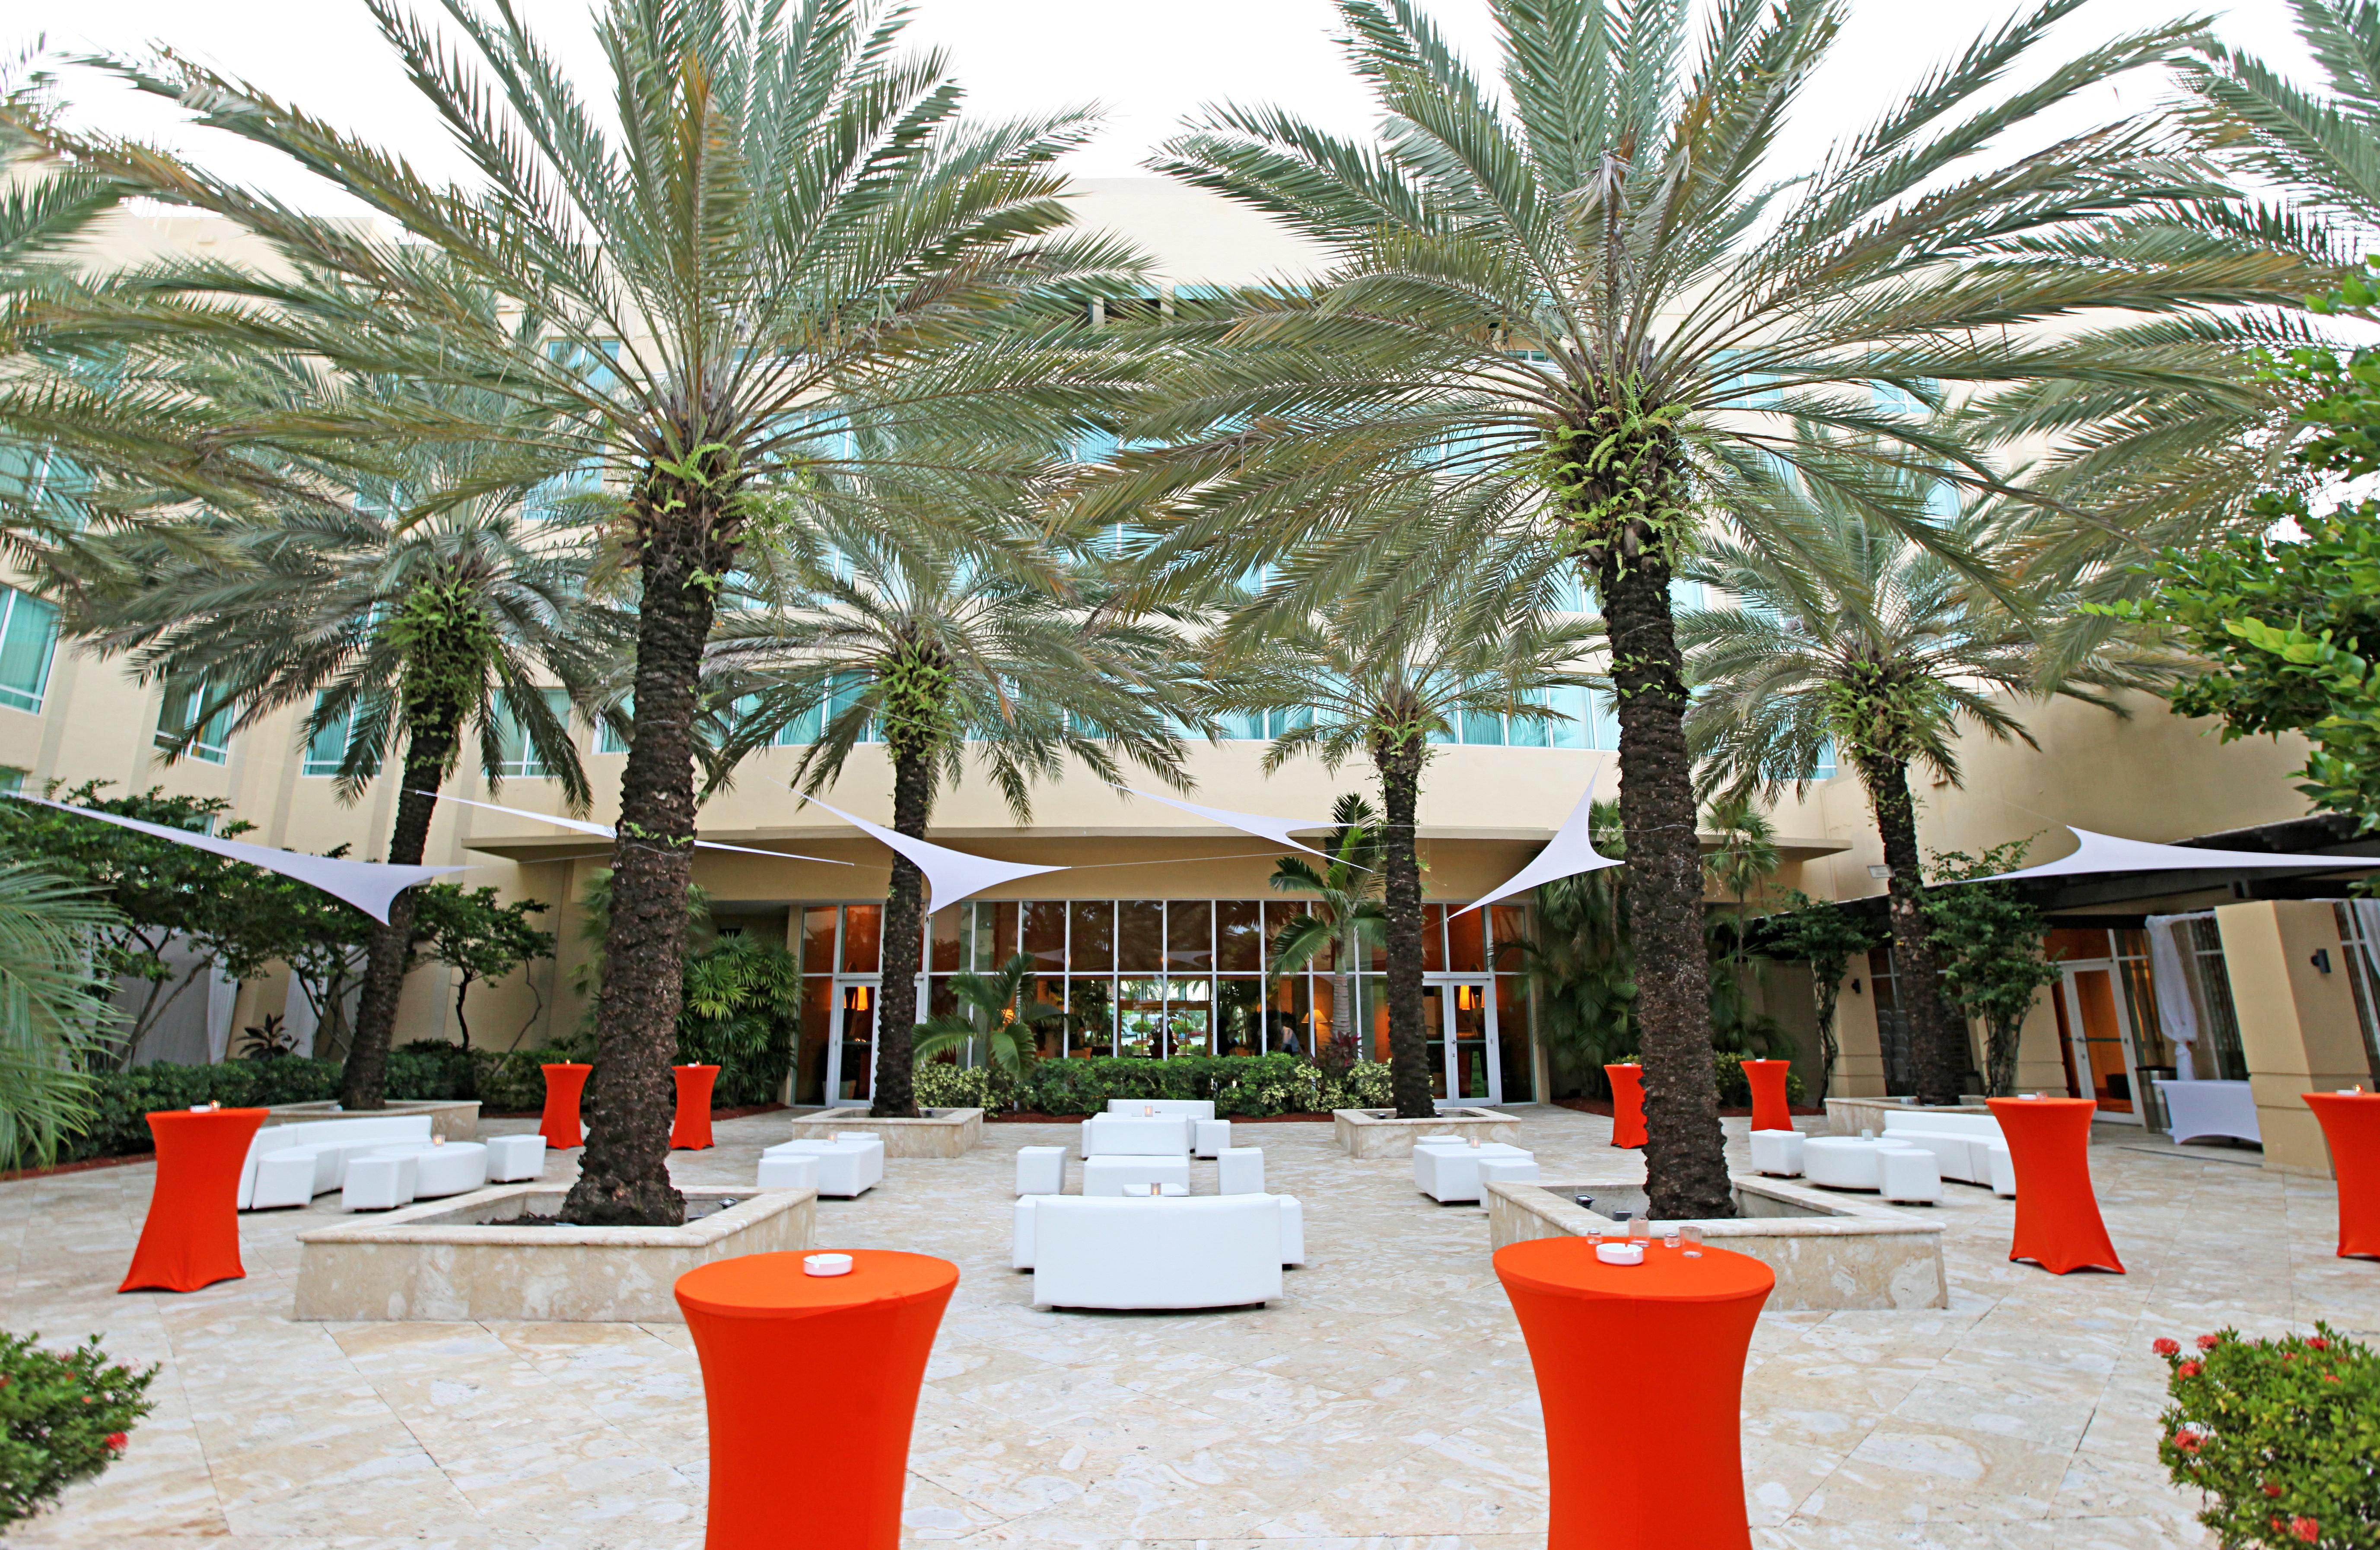 Grounds Lounge Resort tree palm plant property arecales restaurant hacienda palm family caribbean Villa Garden lined